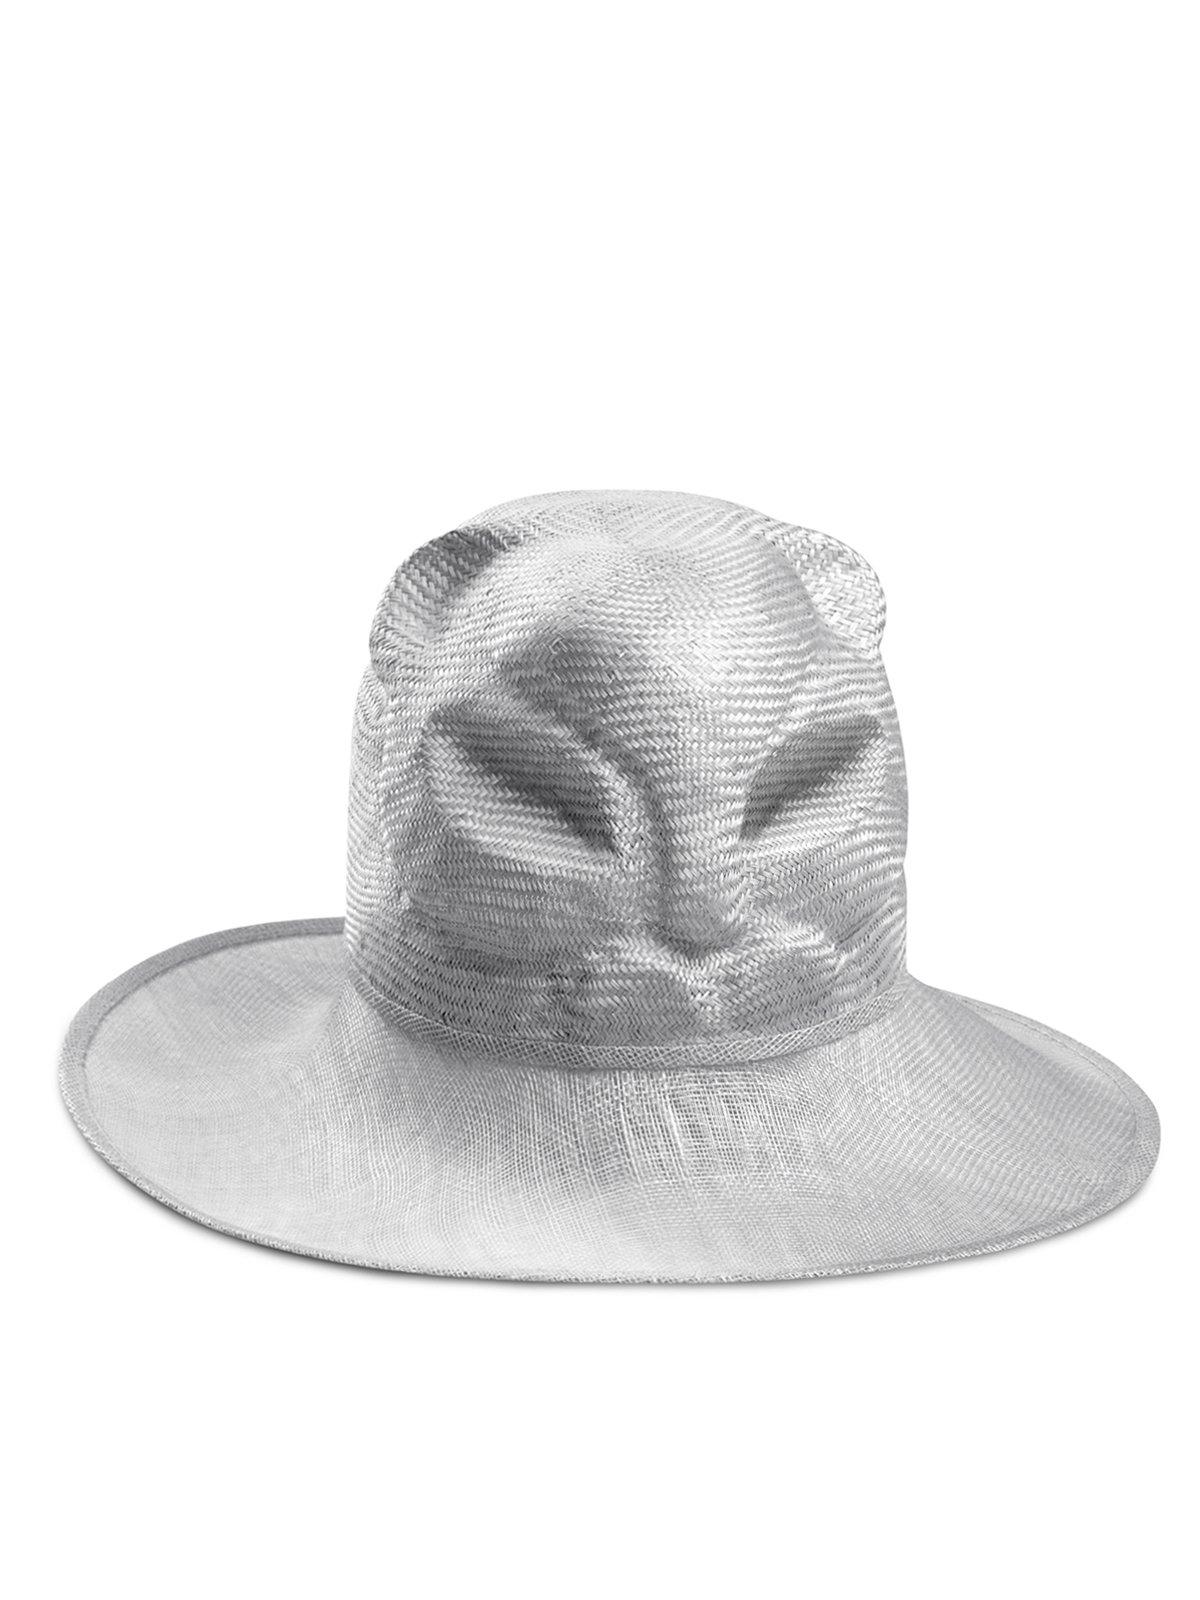 Cat ScottishFold Hat